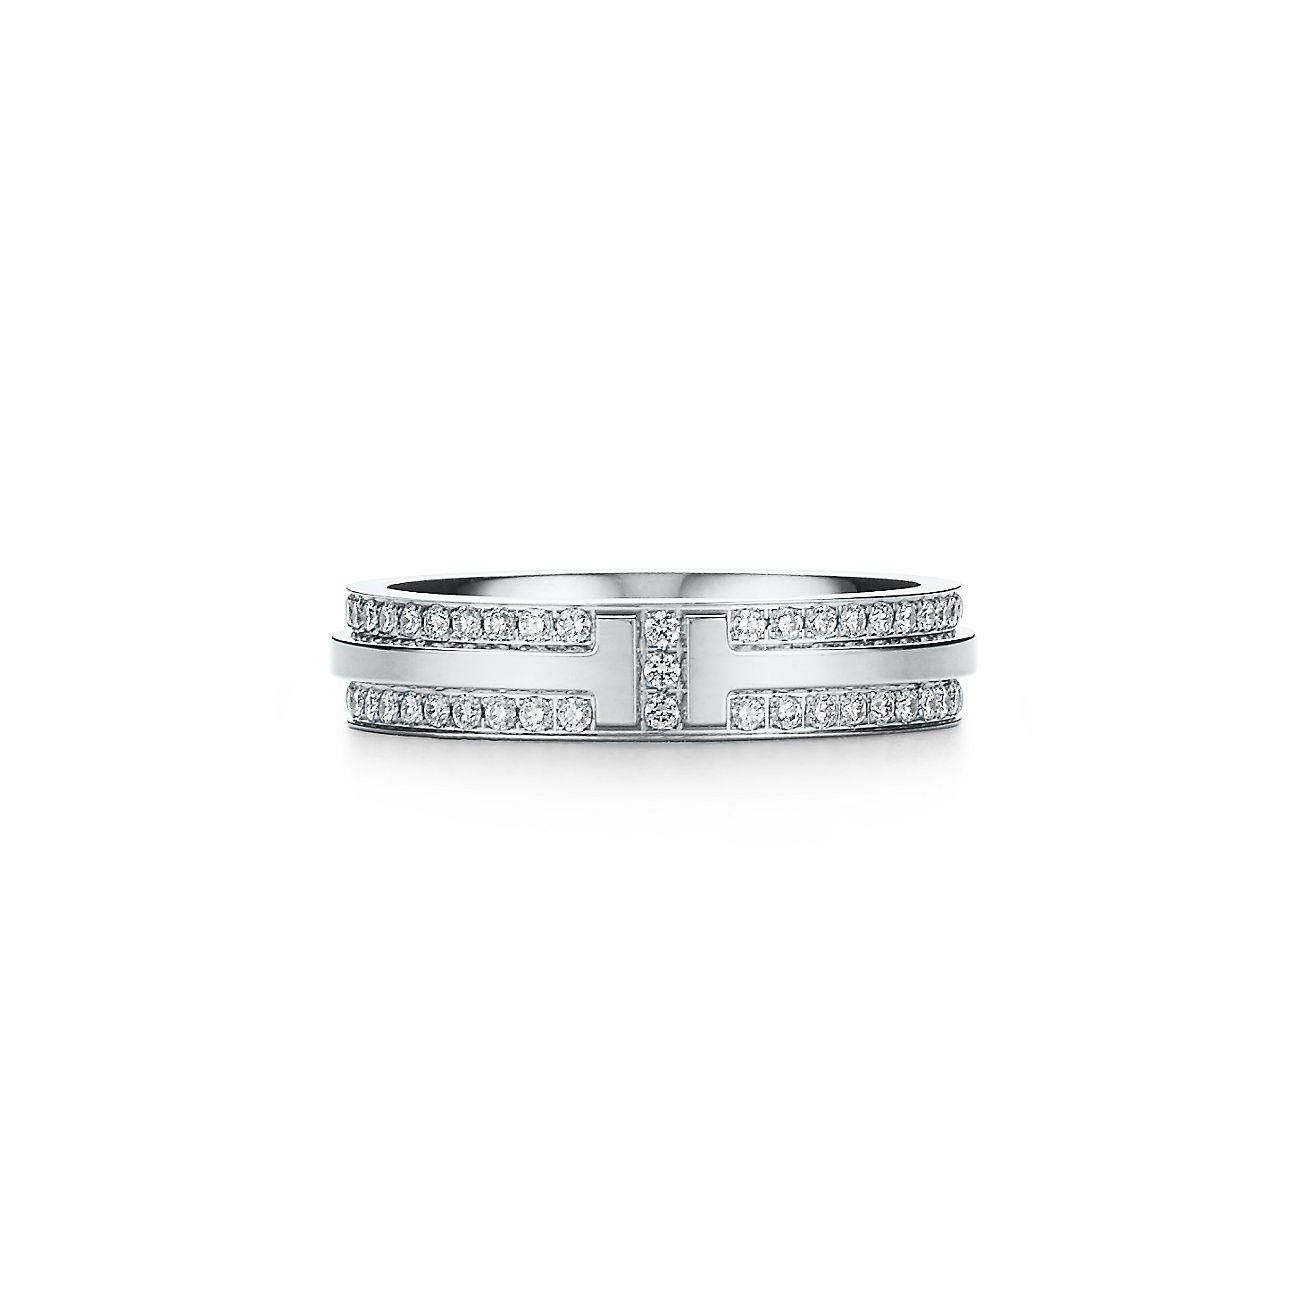 Tiffany 1837 narrow ring in 18k rose gold with diamonds - Size 11 1/2 Tiffany & Co.